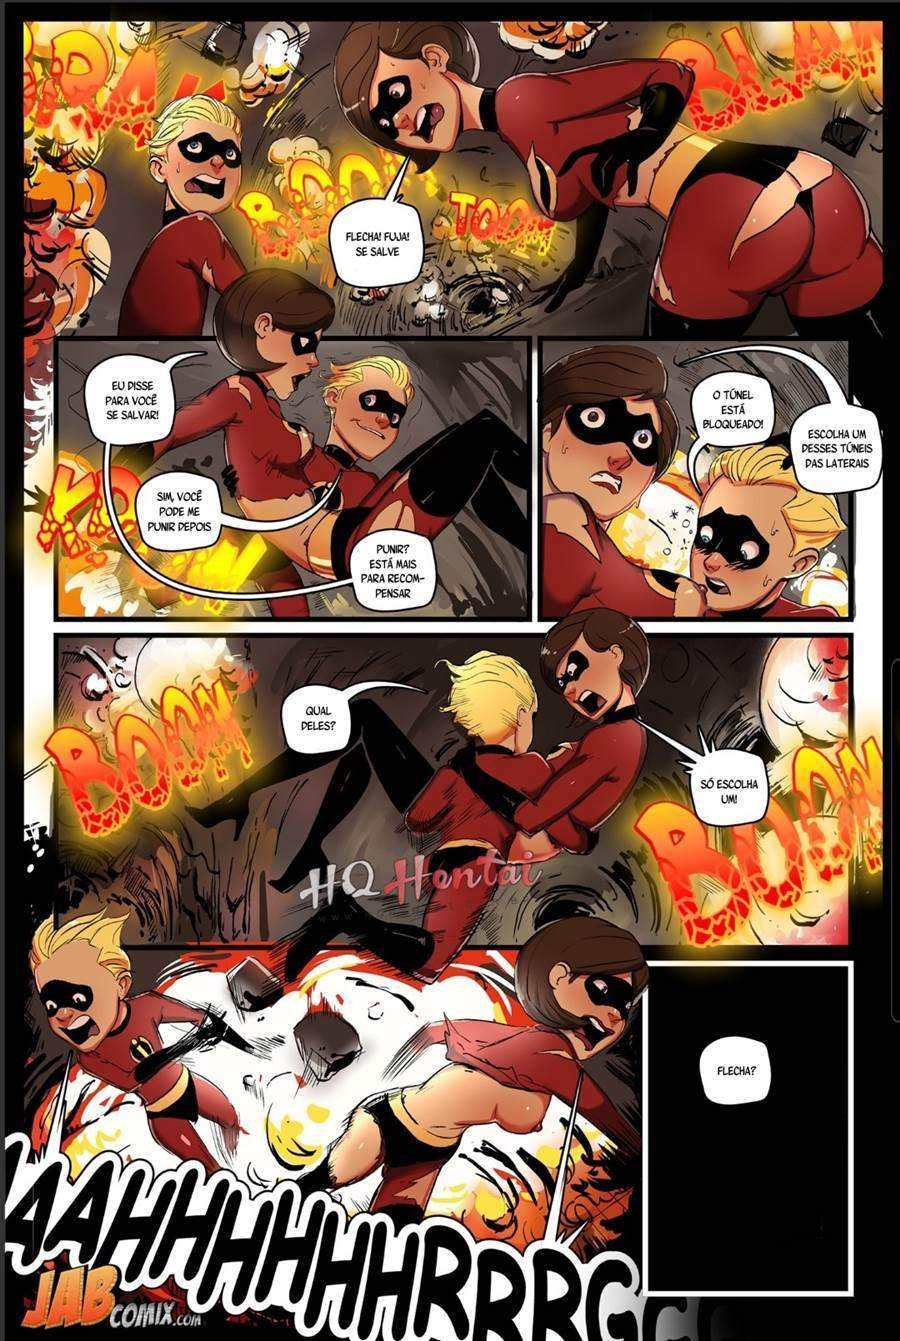 Os Improvaveis part 2 Disclaimer Hentai 03 - hentai, comics-hq